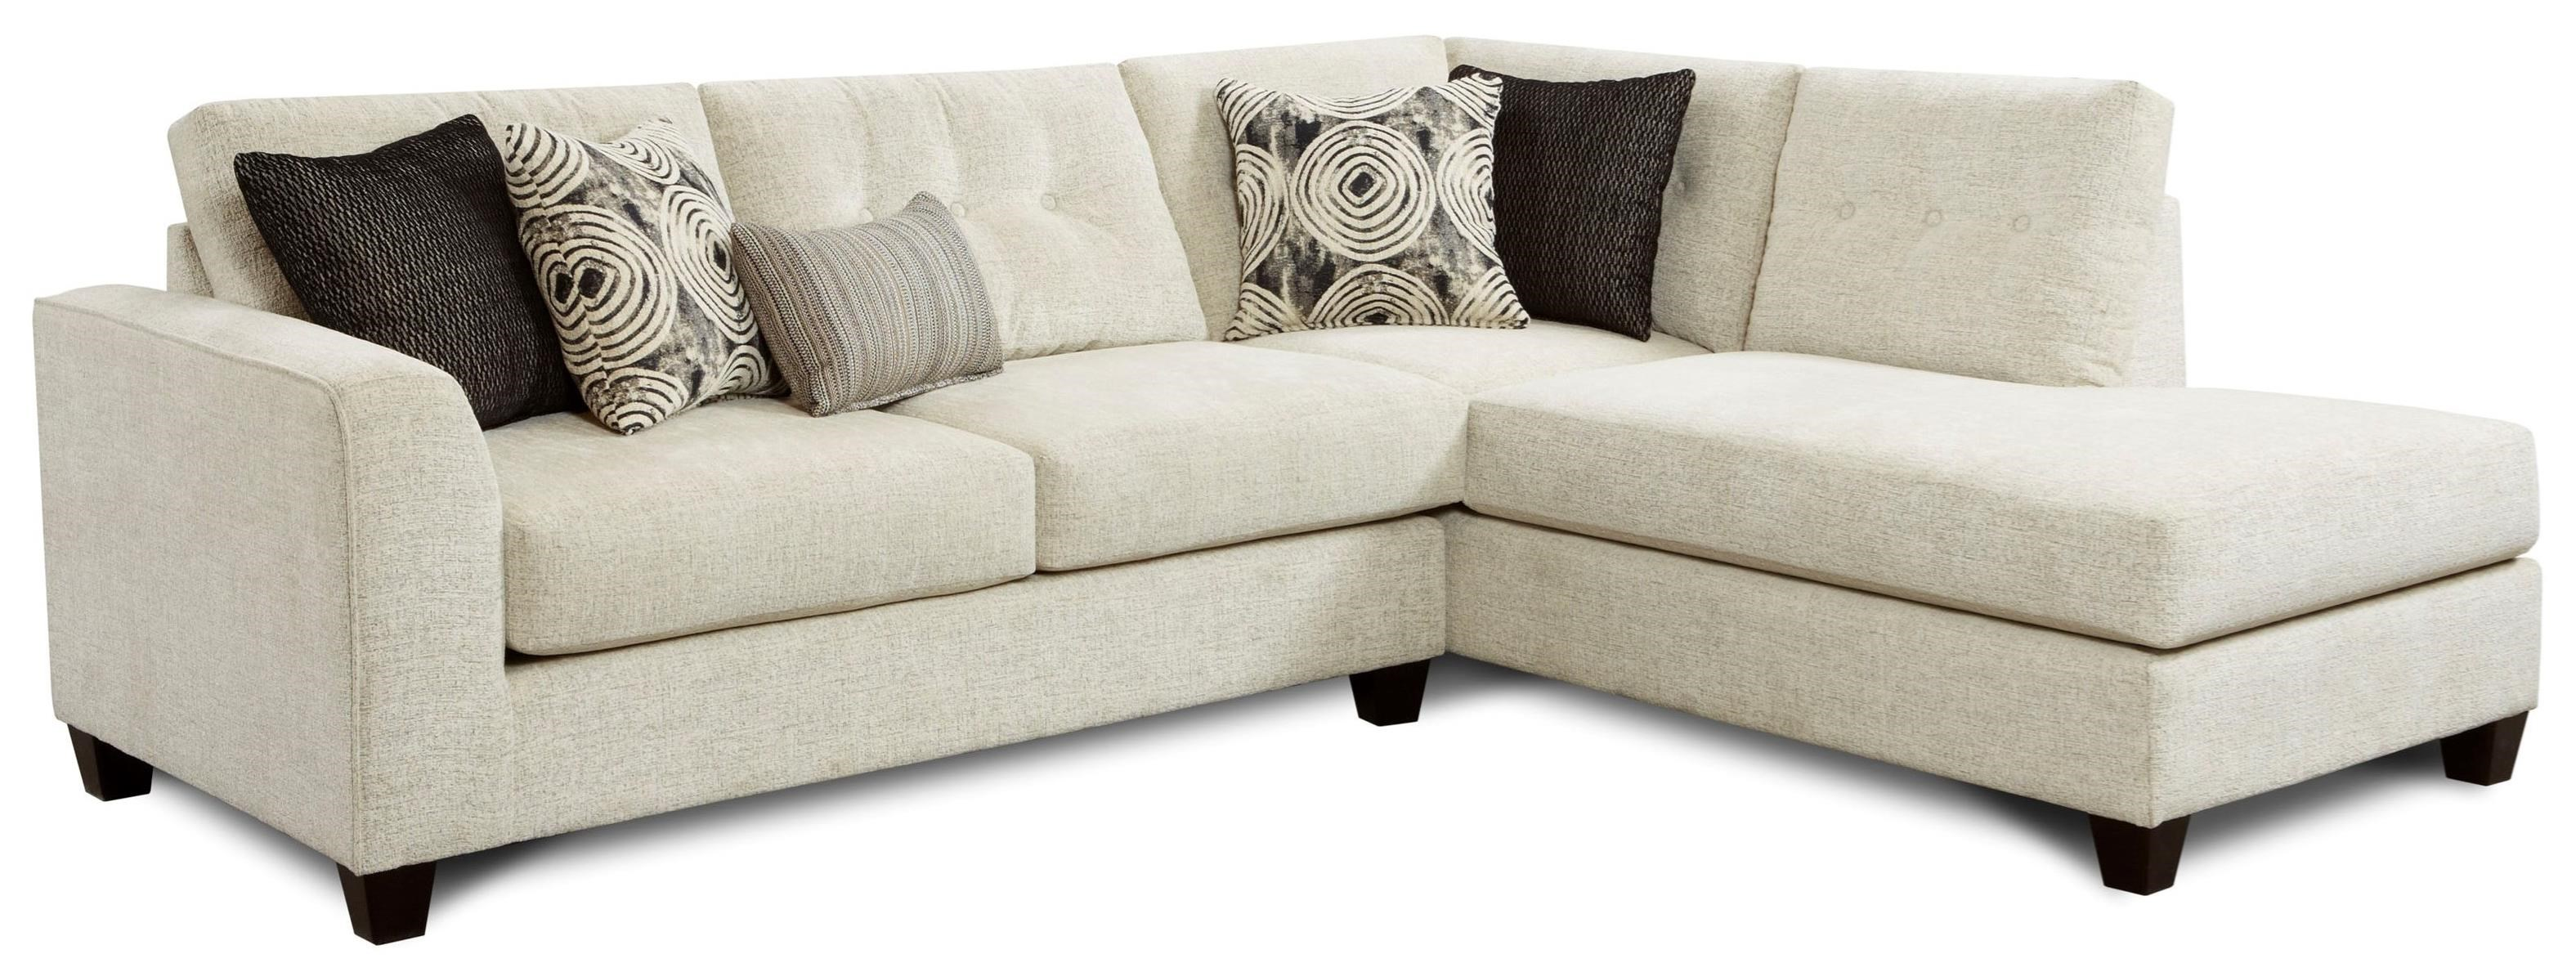 sofa maker beige leather sectional ab aziz